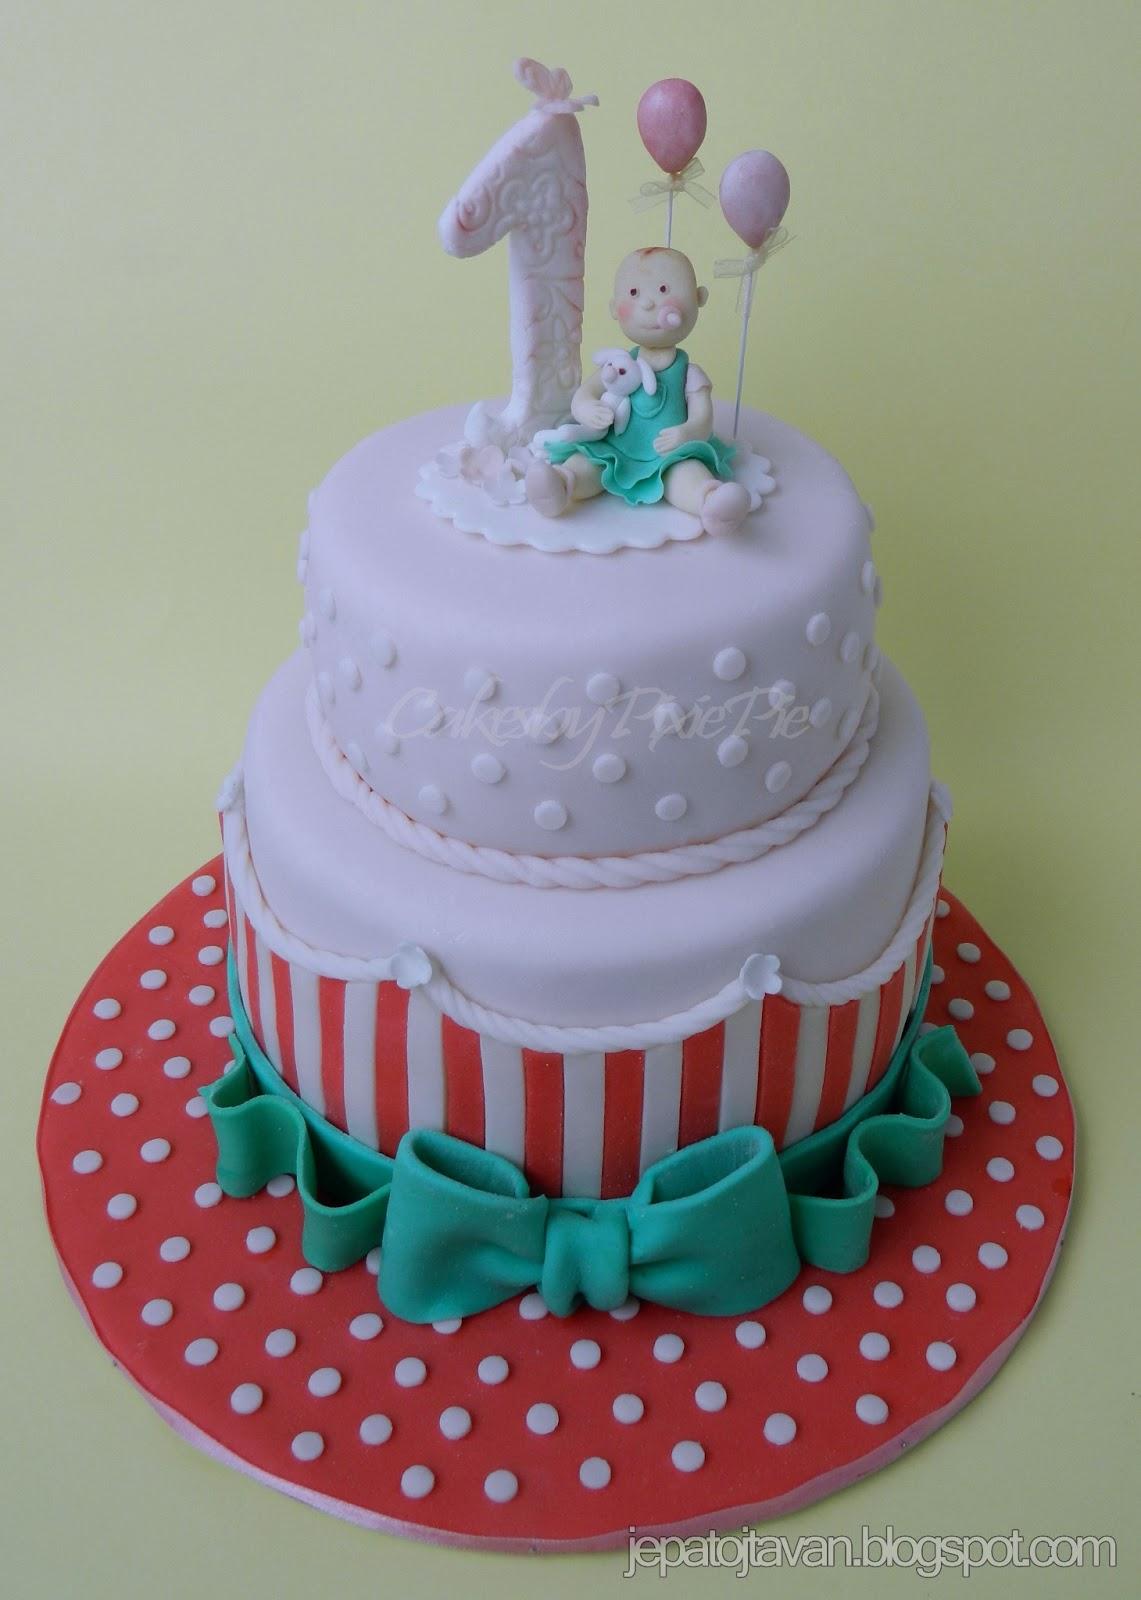 első szülinapi torta Jépatojta van!: Torta első szülinapra liberális szellemben :) első szülinapi torta